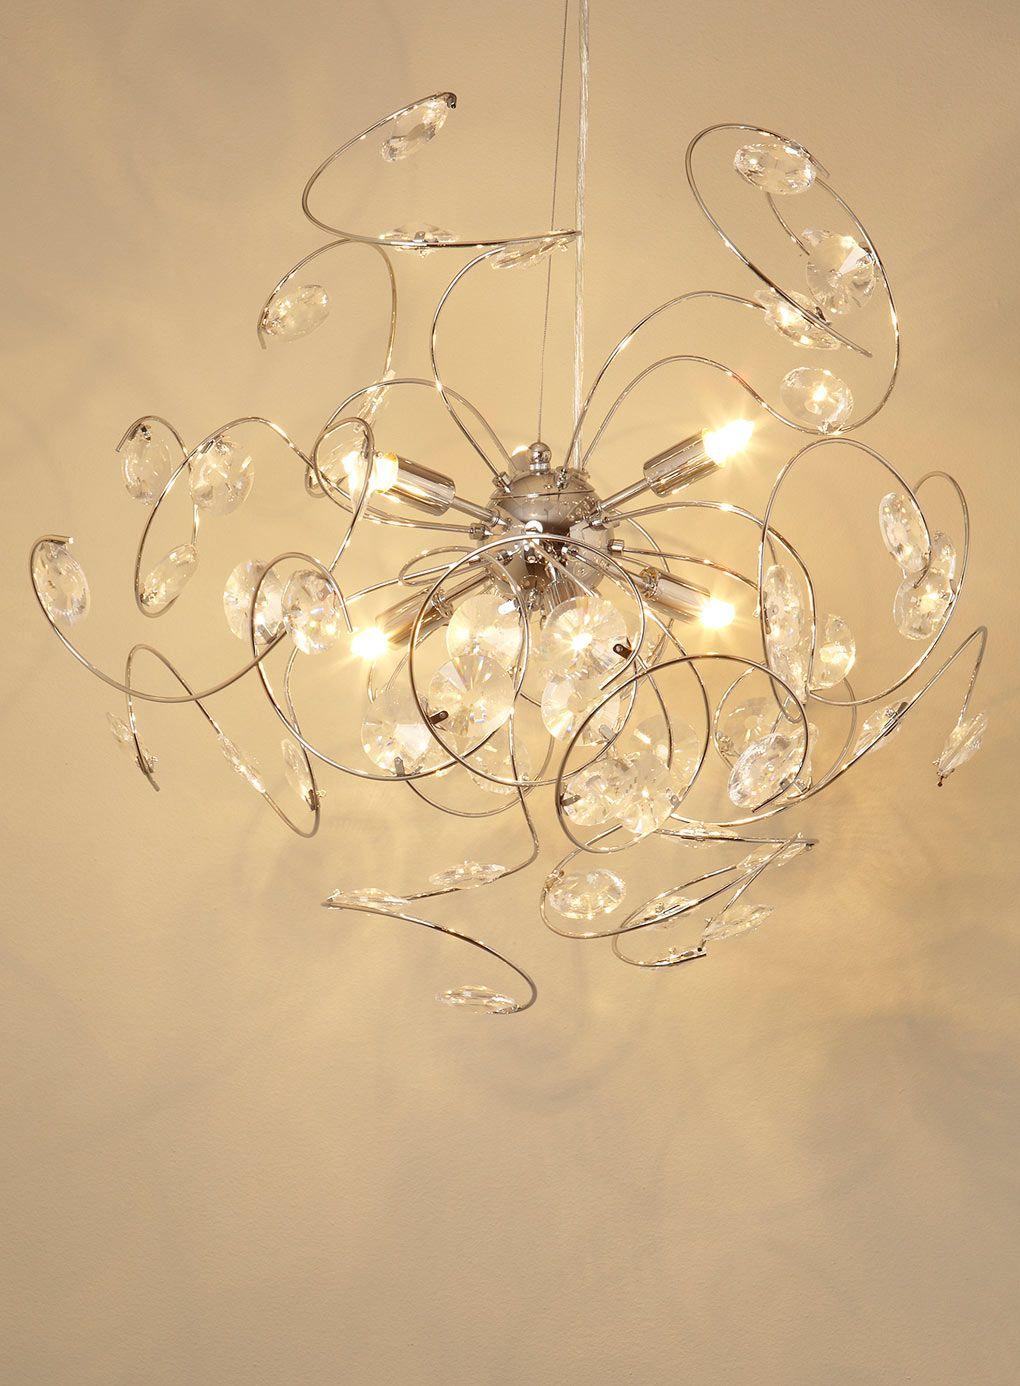 Lila sputnik ceiling light sale hidden bhs iklandrma lila sputnik ceiling light was now colour chrome item code 9768010409 mozeypictures Image collections